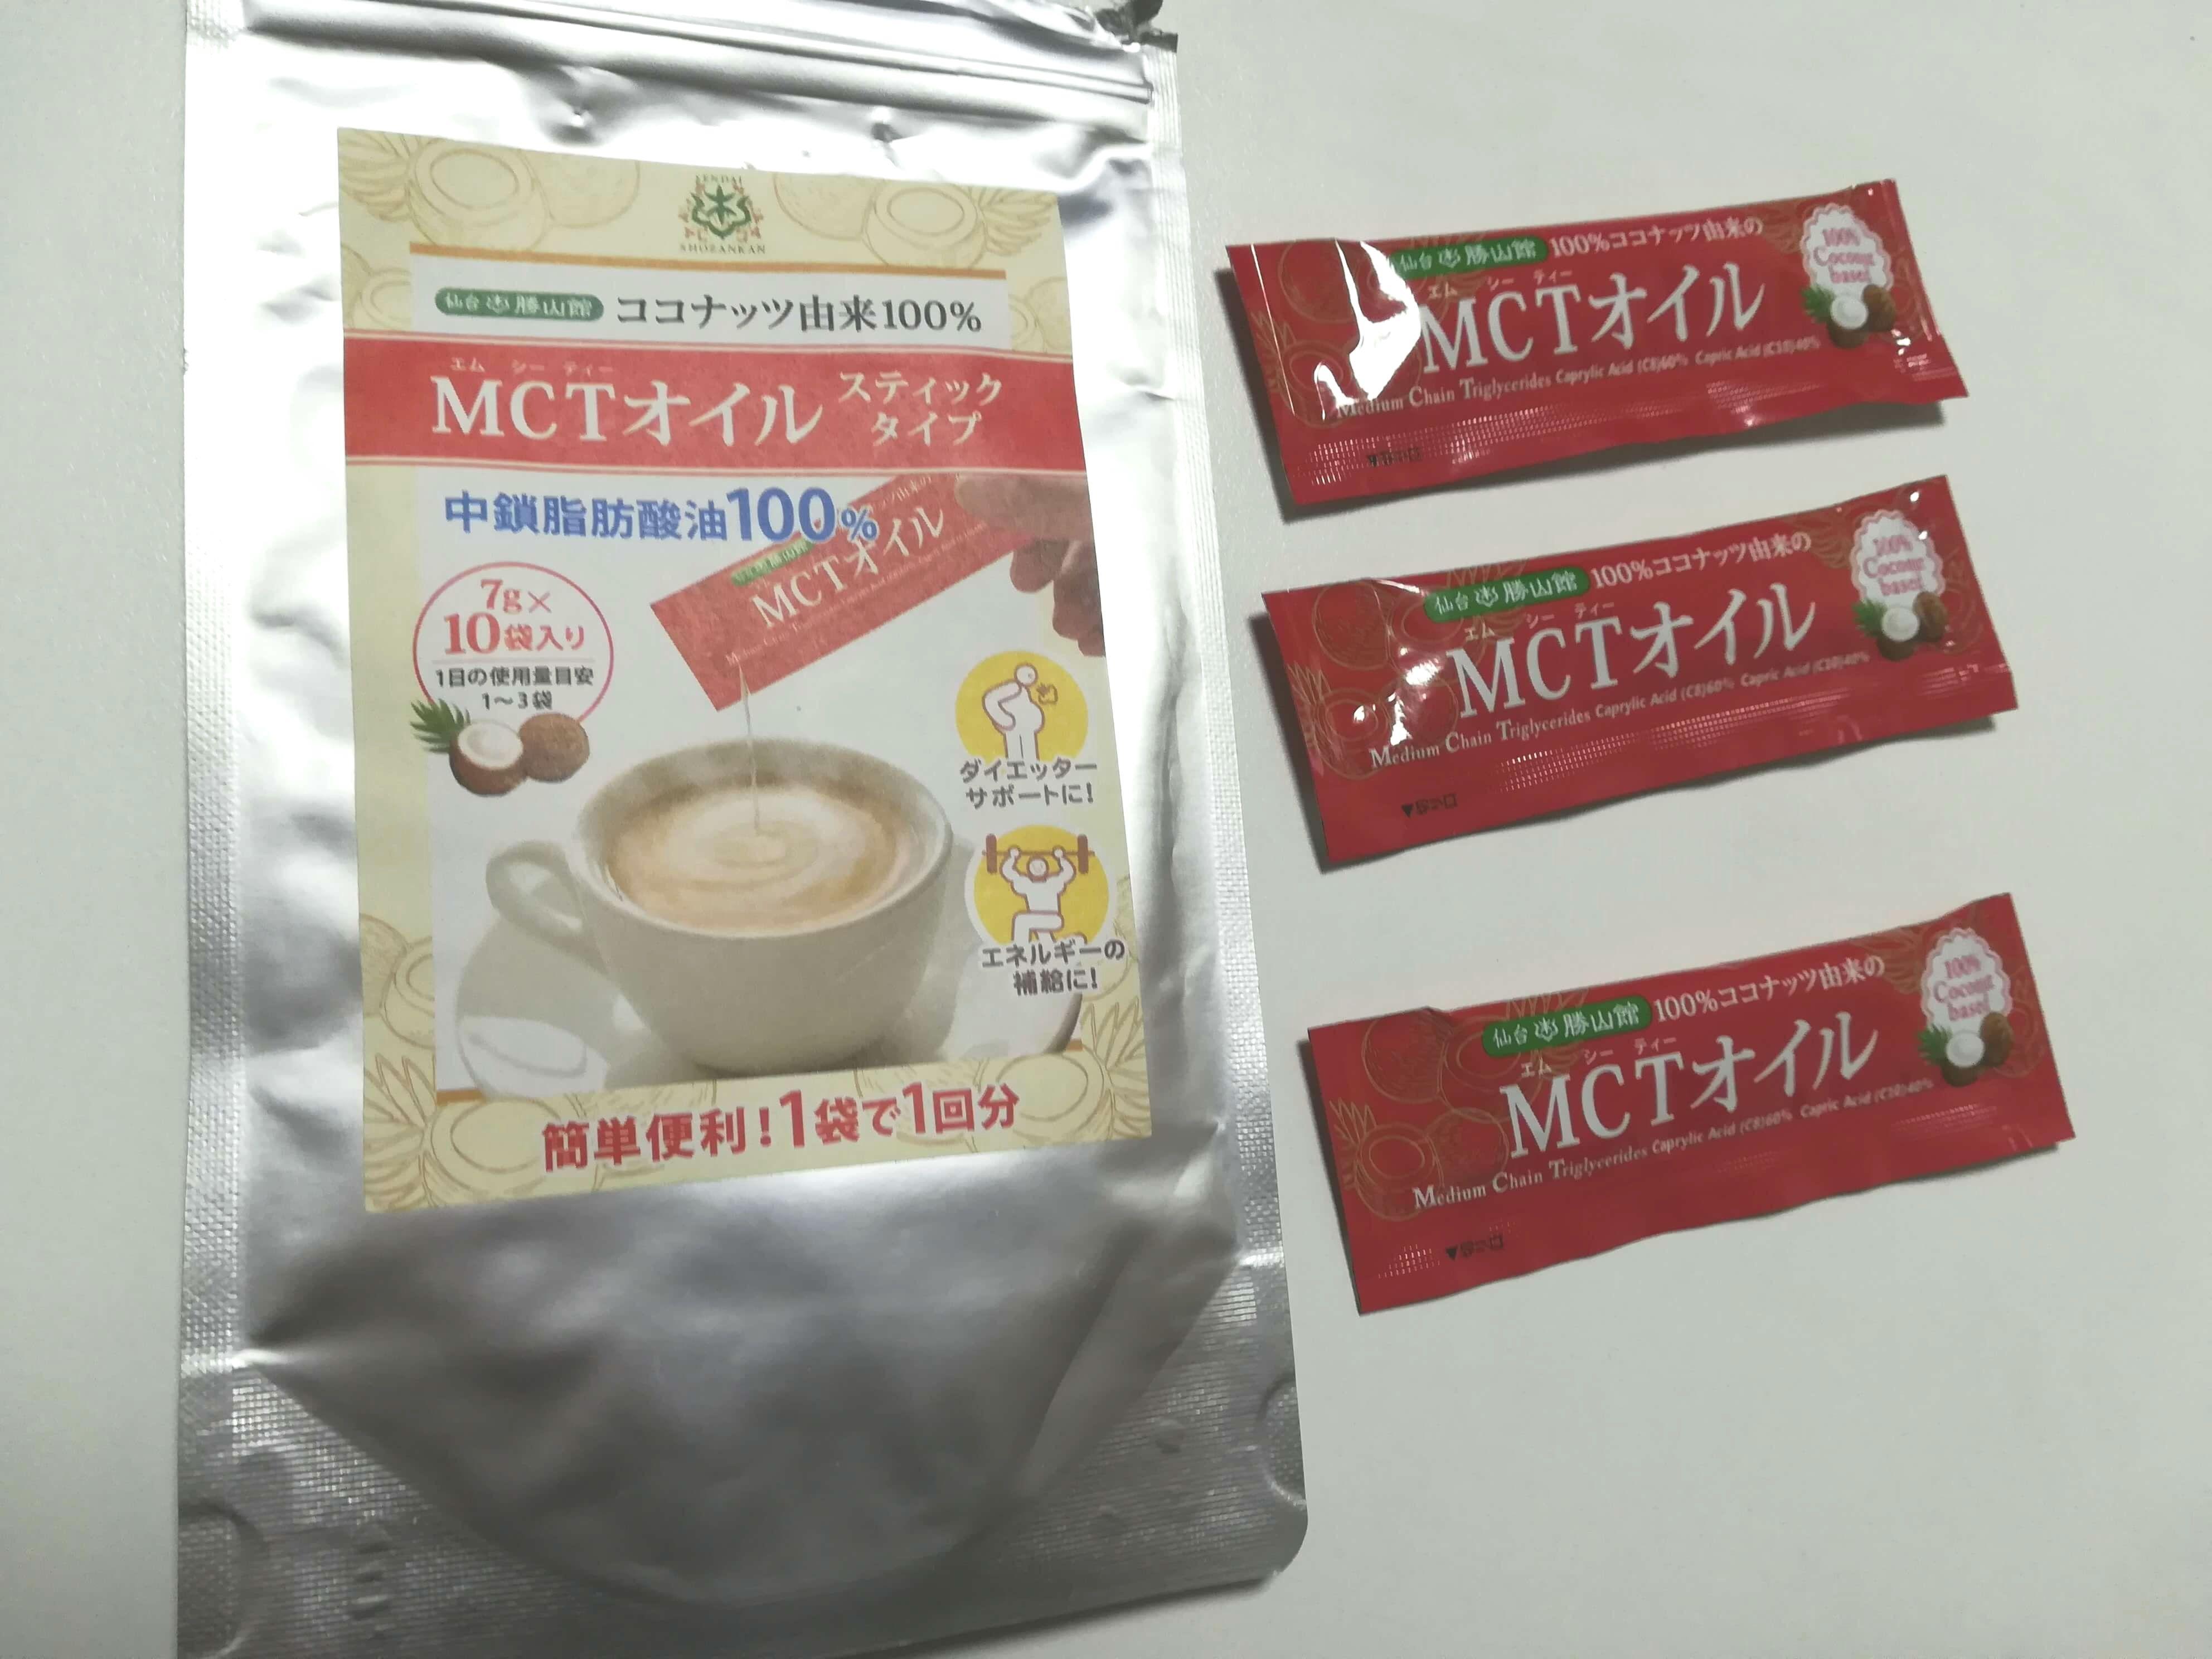 MCTオイル(中鎖脂肪酸)をウルトラマラソンで使用した感想